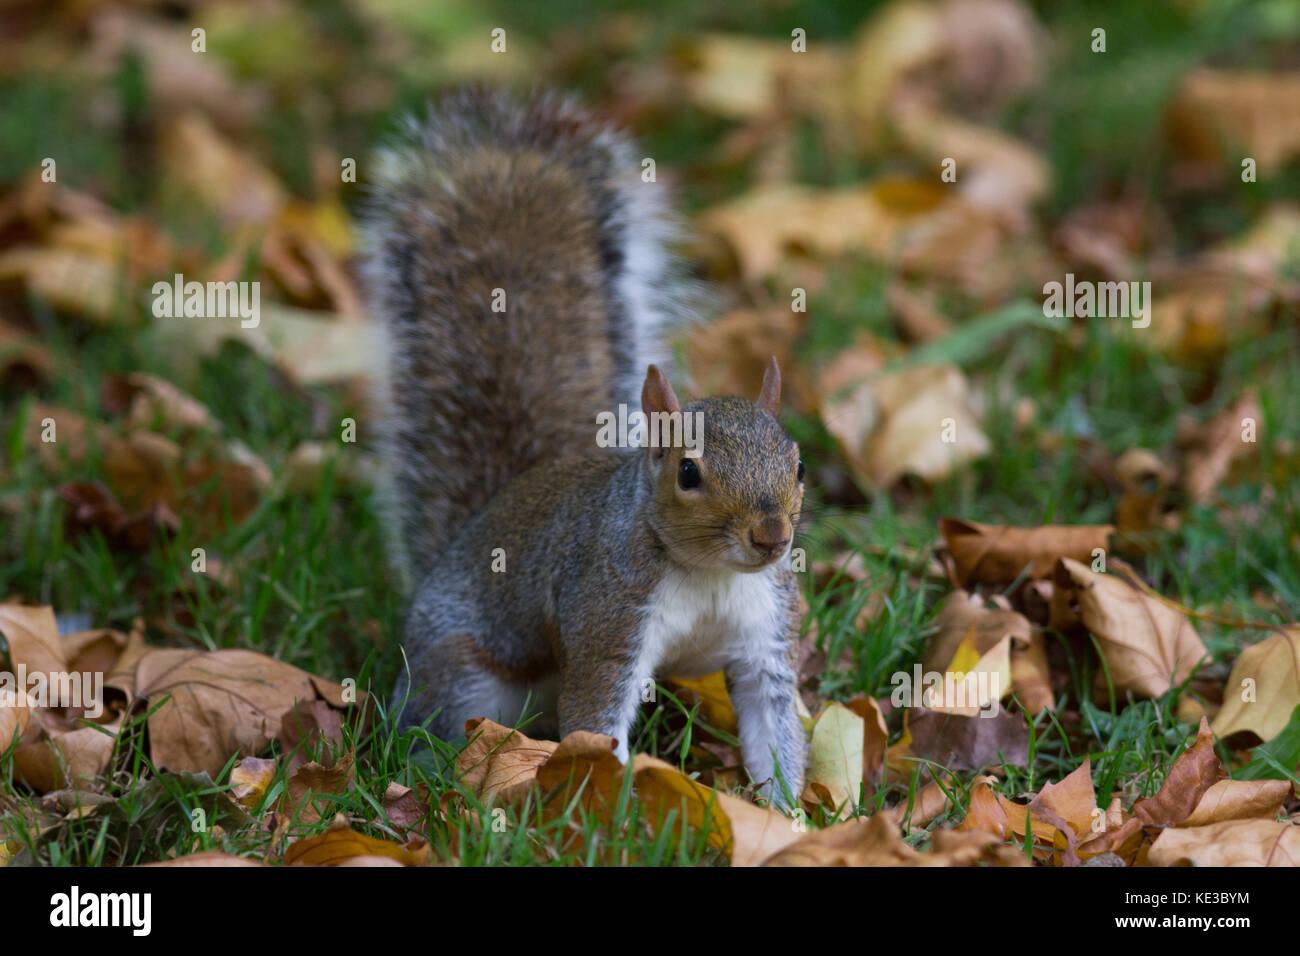 Grey squirrel in autumn park, telephoto - Stock Image